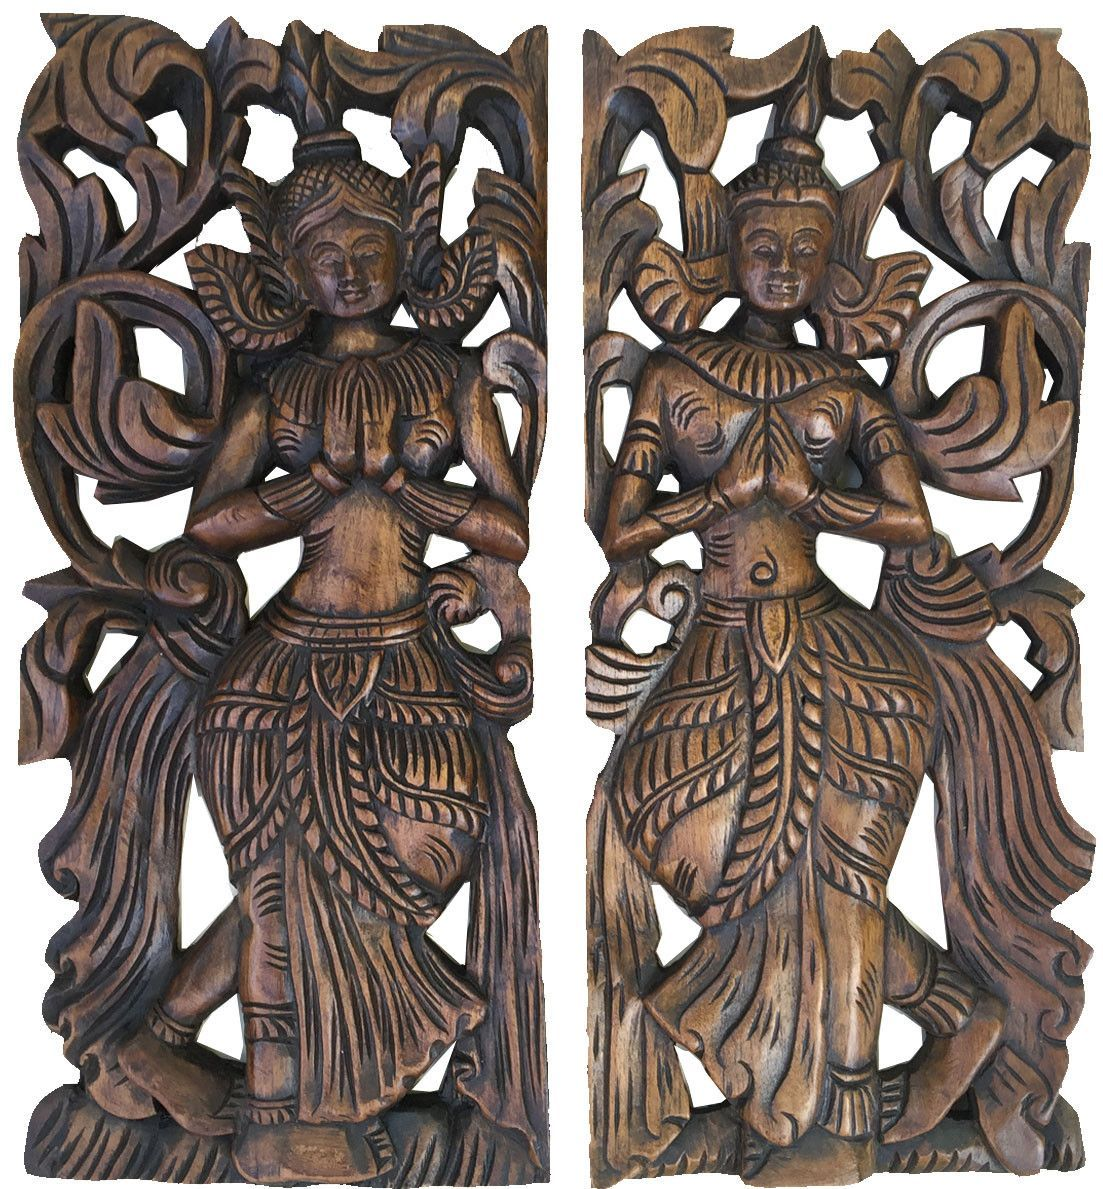 Oriental Wood Wall Decor. Carved Wood Wall Art. Decorative Thai Wood Carving  Wall Art